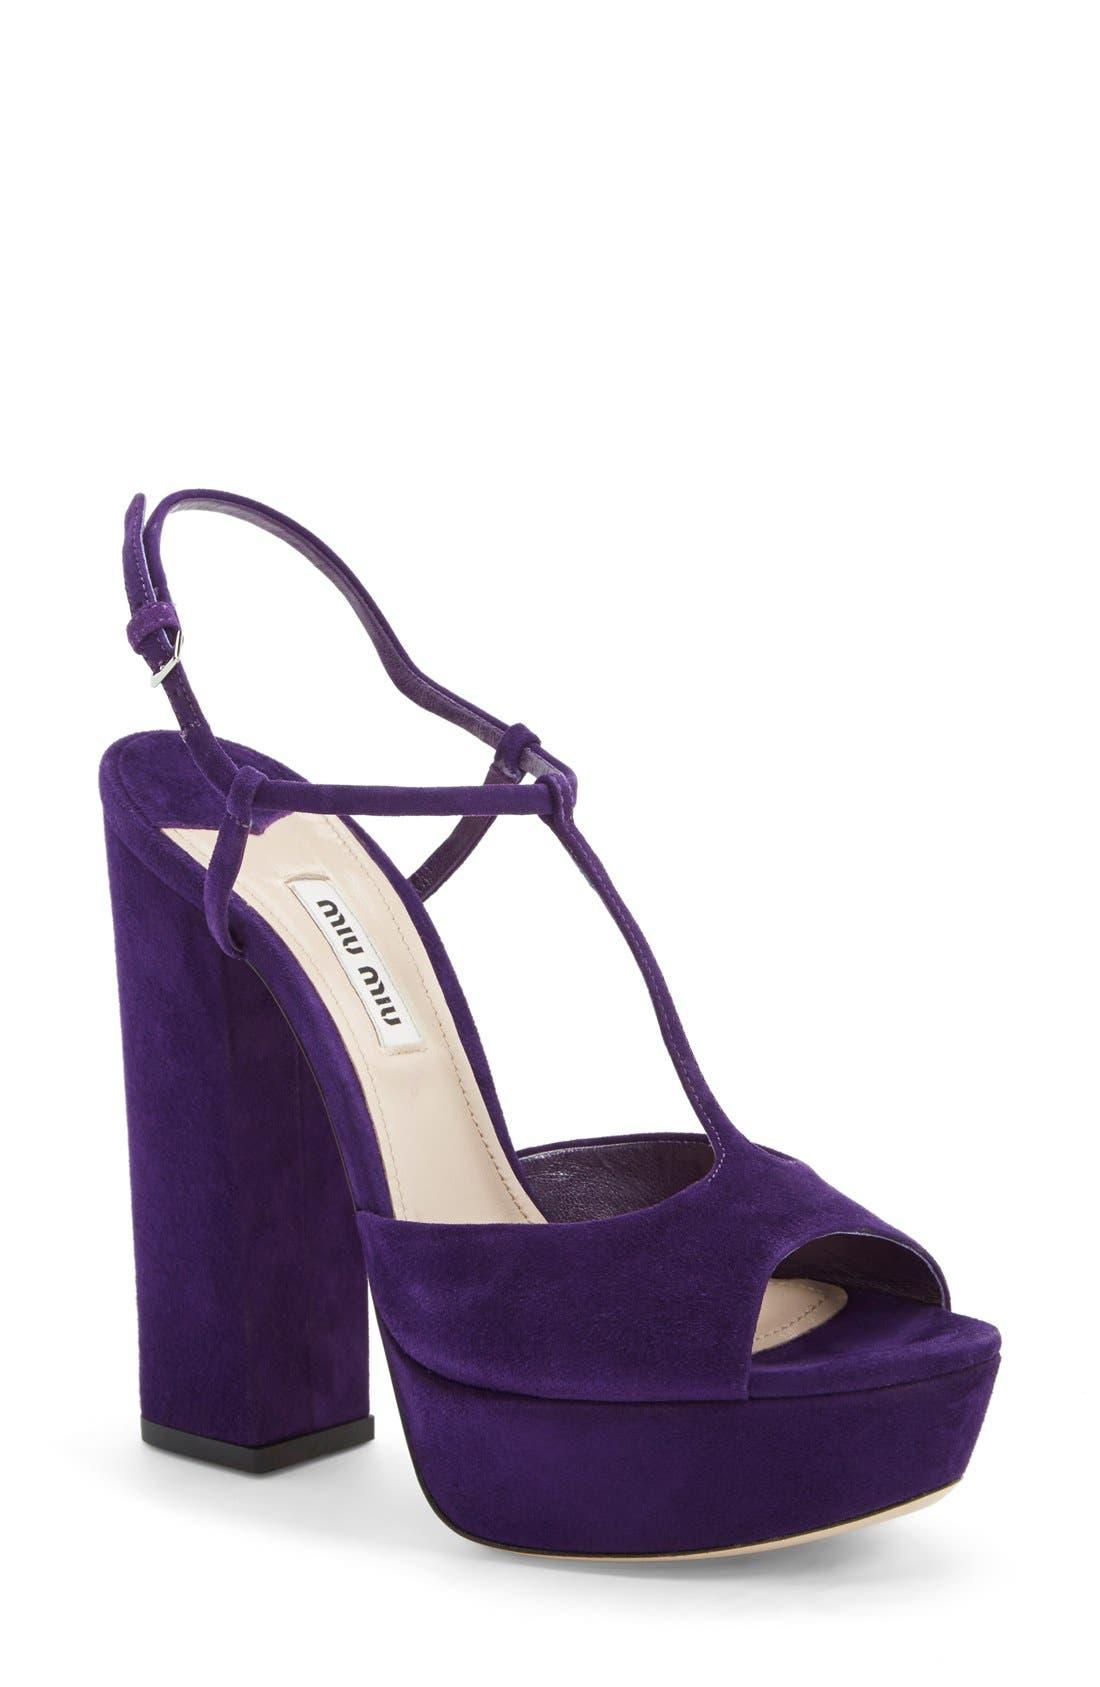 Main Image - Miu Miu Mary Jane Platform Sandal (Women)